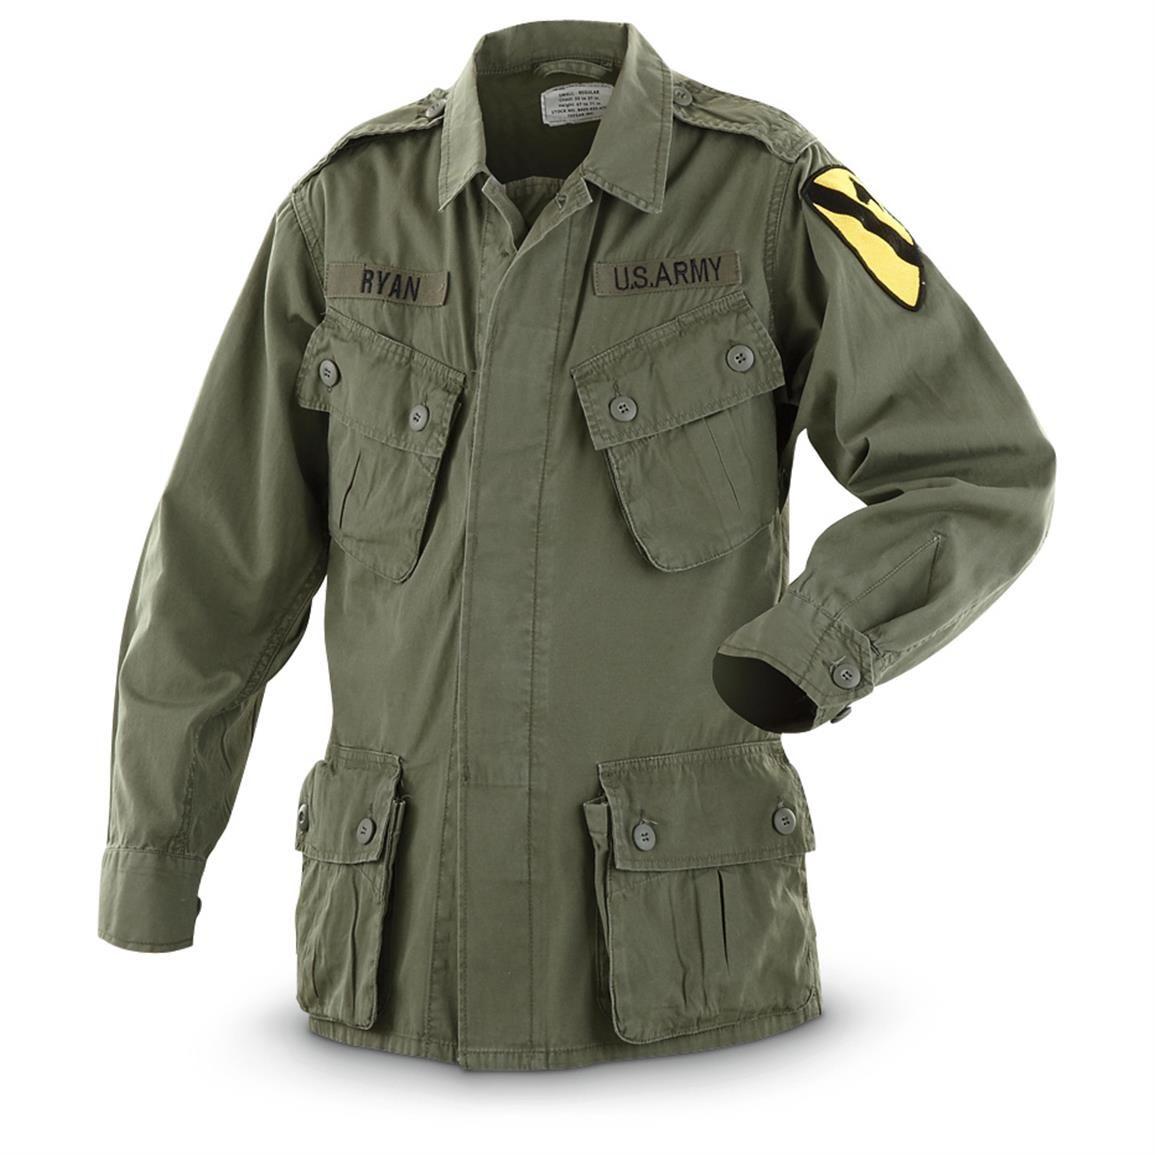 5d0db40d5c4a9 Reproduction U.S. M65 Field Jacket | Military Surplus | Jackets ...